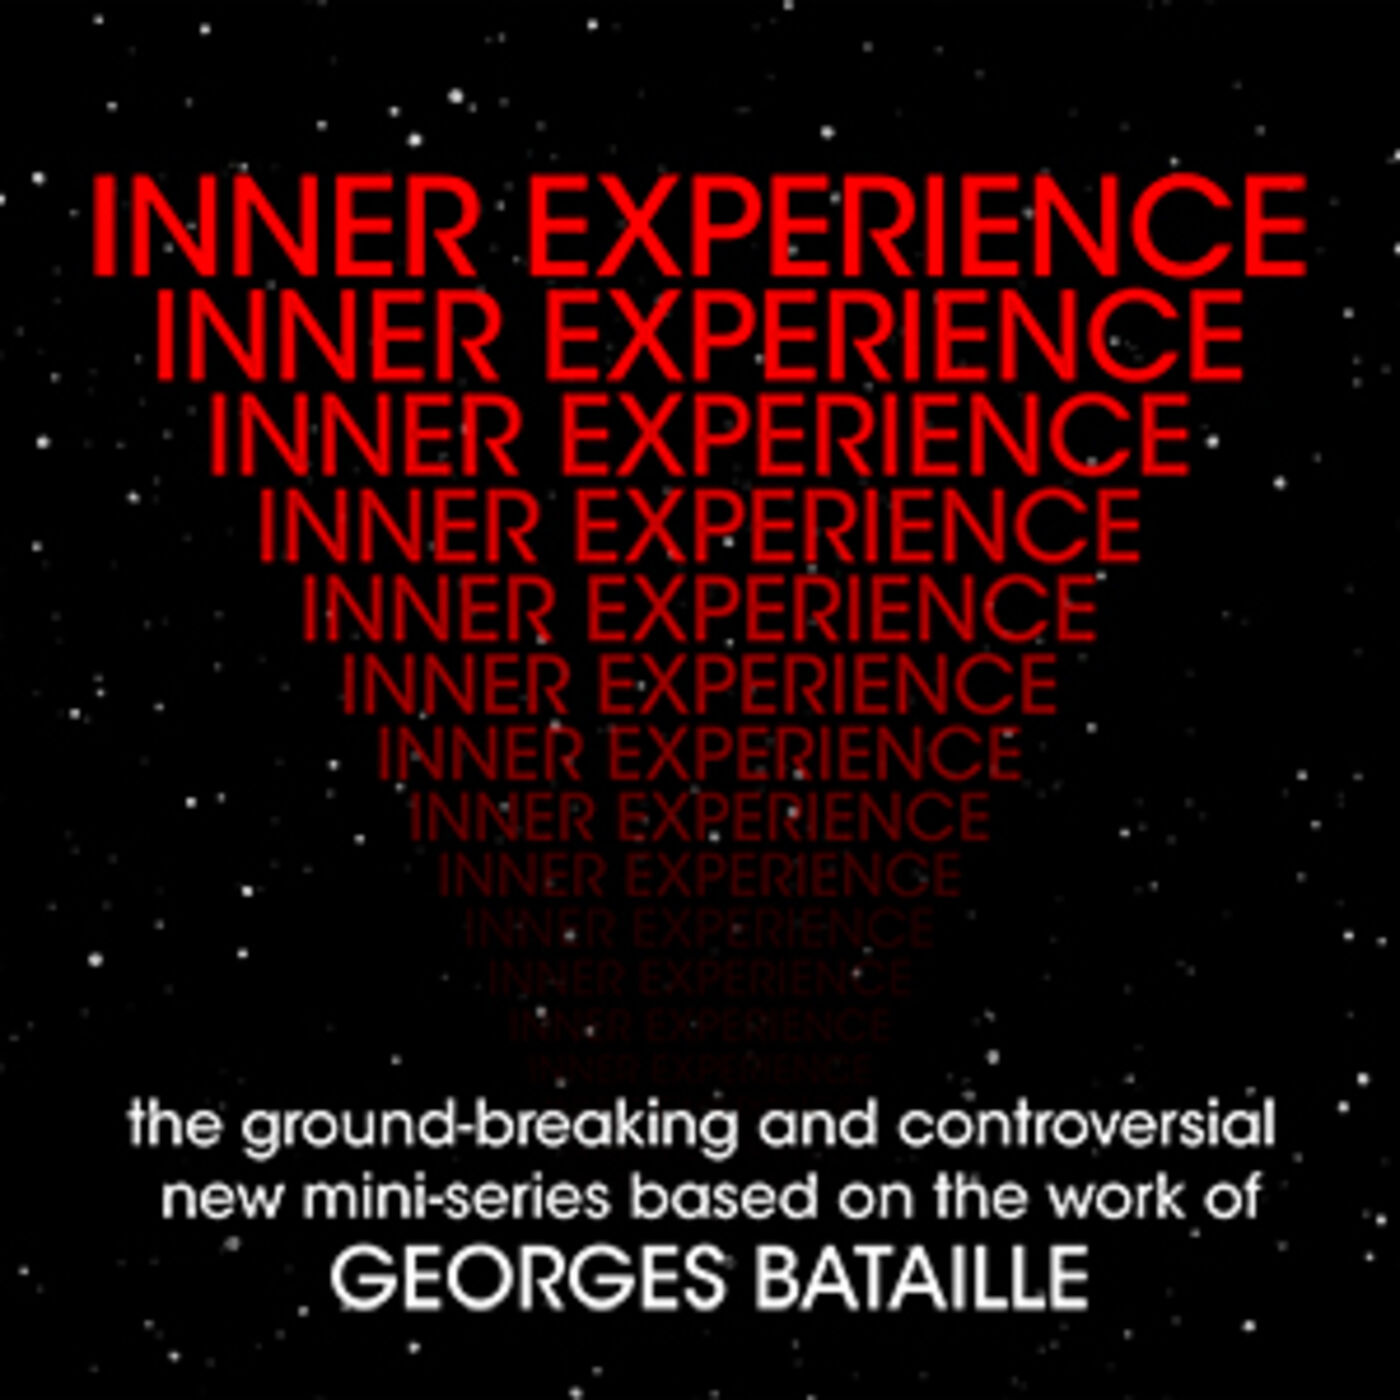 Inner Experience: Psychoanalysis, Schizoanalysis, and Dreams